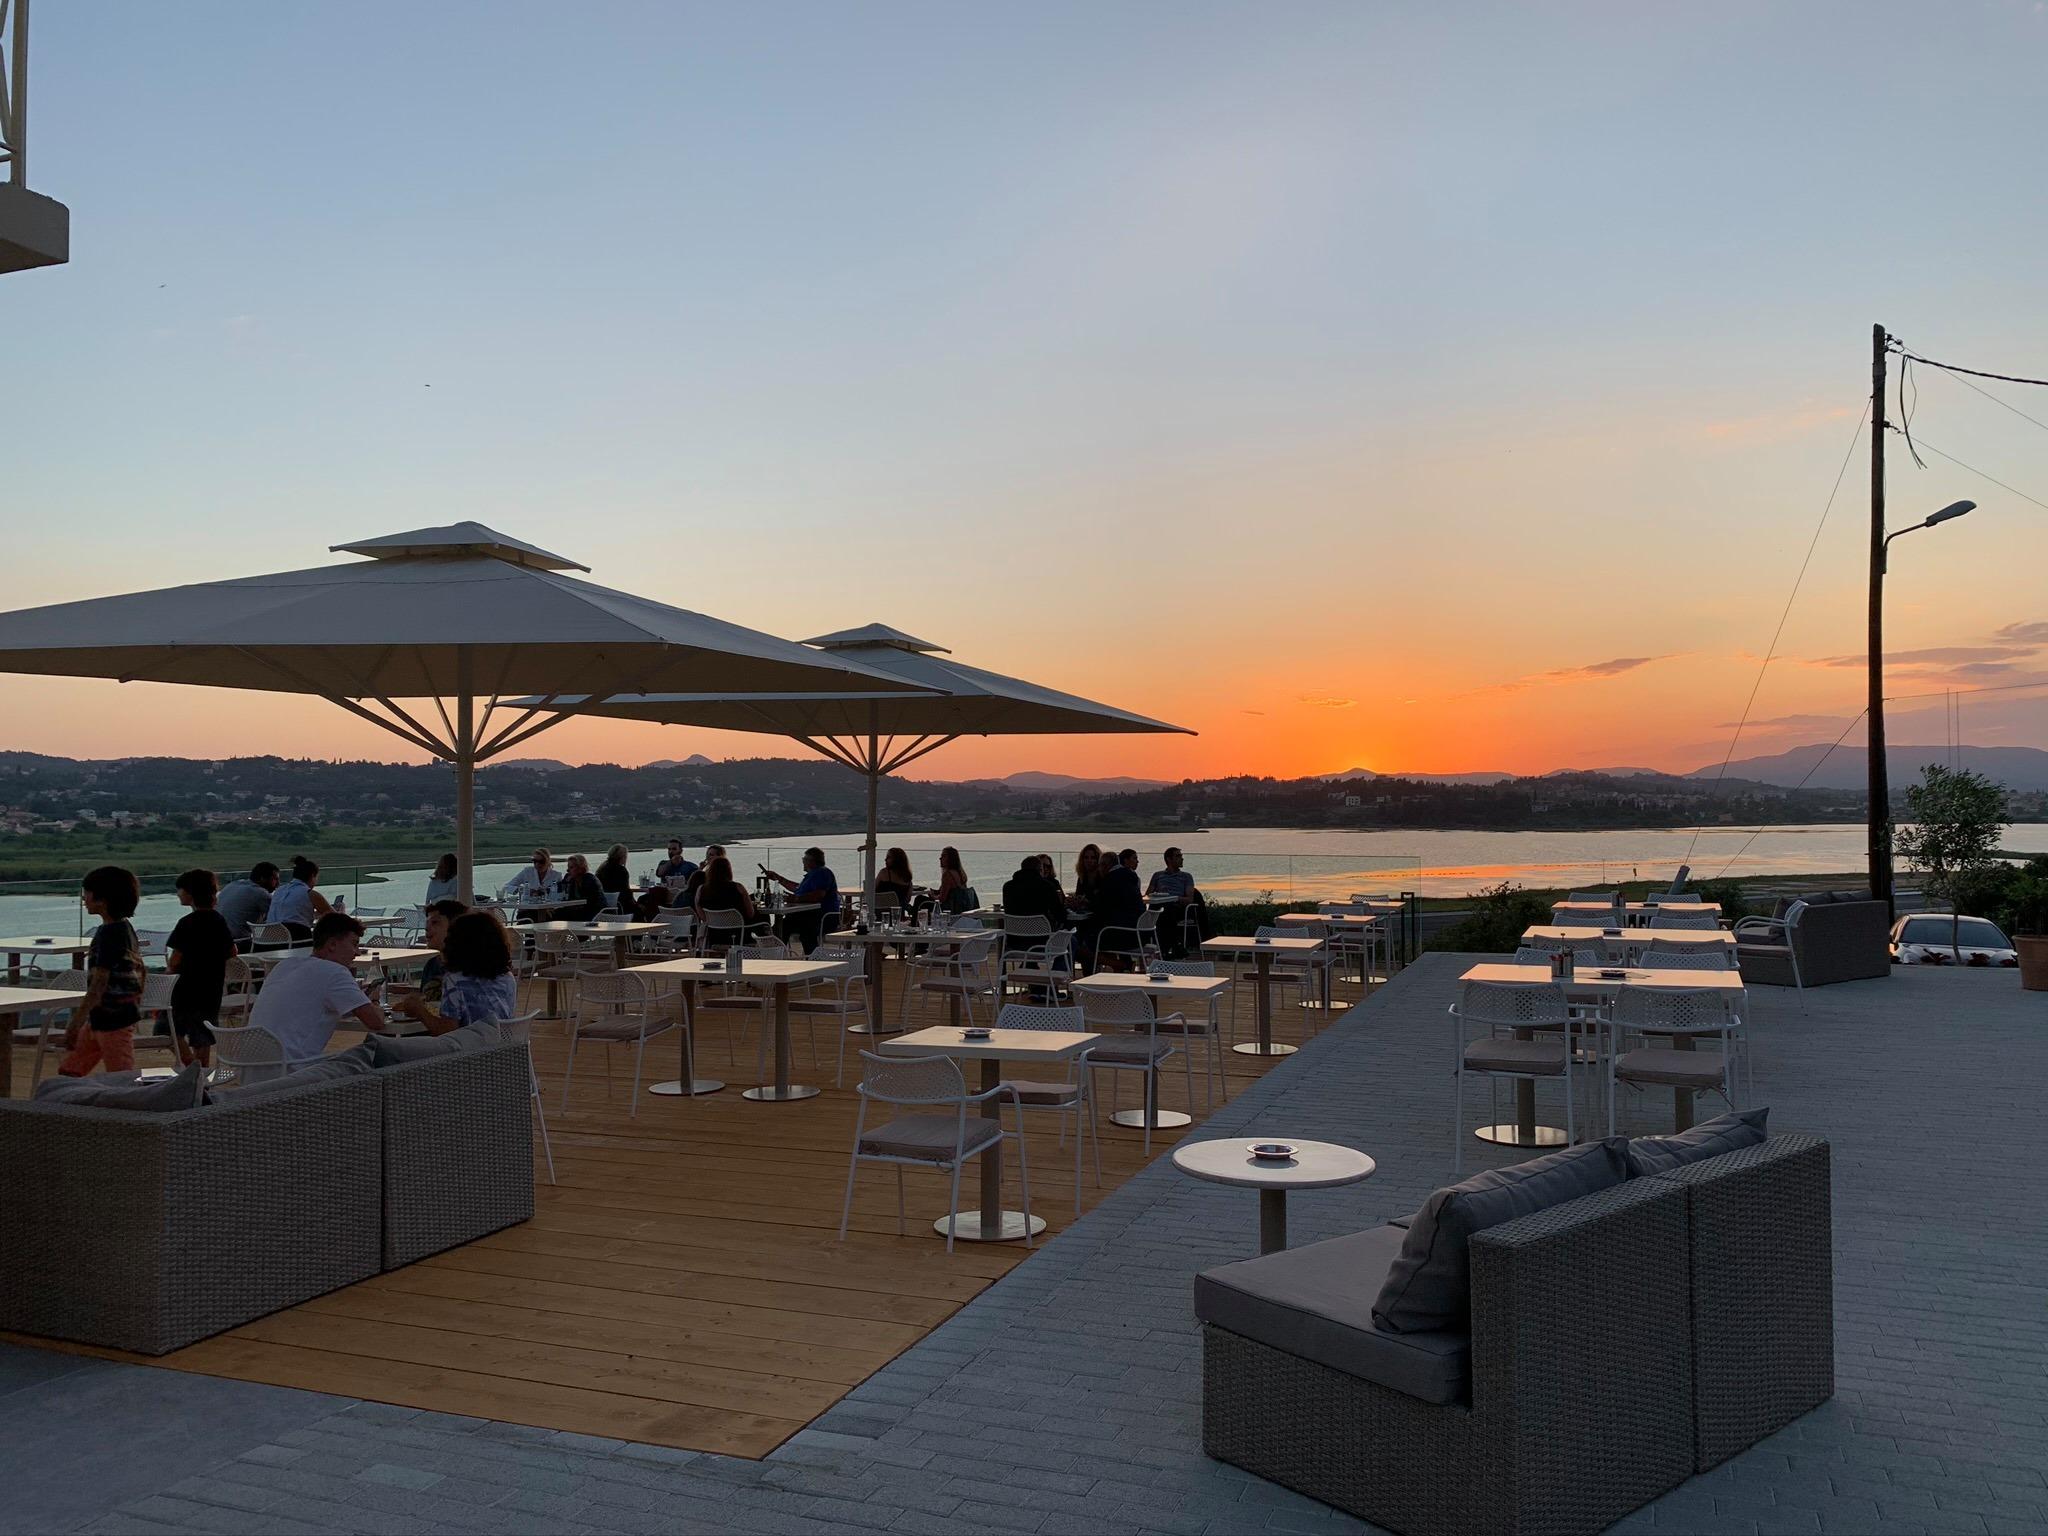 Skyview All day place (1) Corfu-Kanoni Κέρκυρα | corfugreece.gr